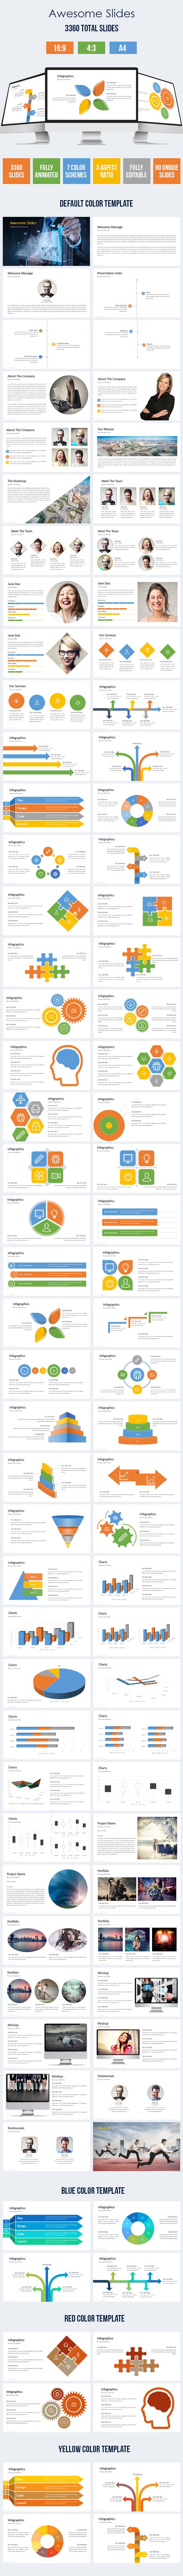 Terrano - Multipurpose Powerpoint Presentation Template - Business PowerPoint Templates